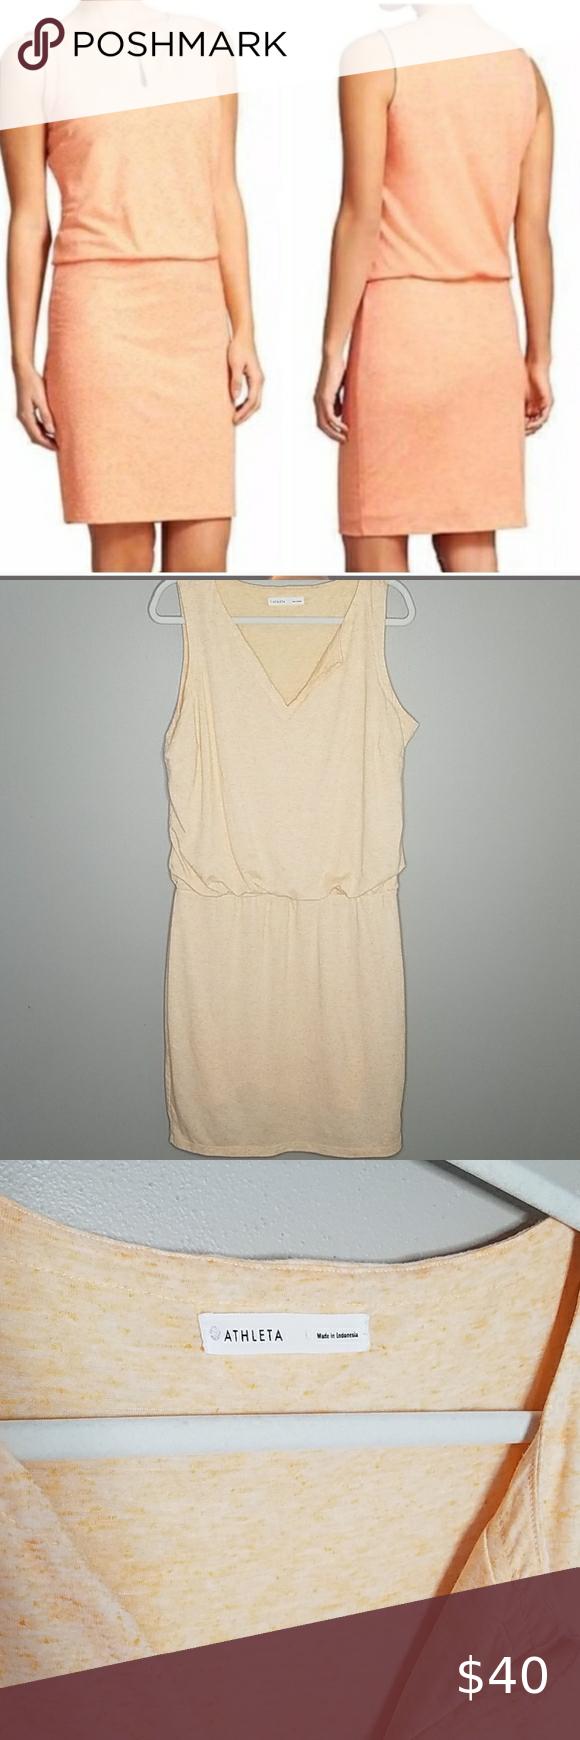 Athleta Orange Linen Vita Dress, Size Large Athleta Orange Linen Vita Dress, Size Large.  Body-82% Polyester, 14% Linen, 4% Spandex.  Lining-85% Polyester, 15% Linen.  Measures approximately 41